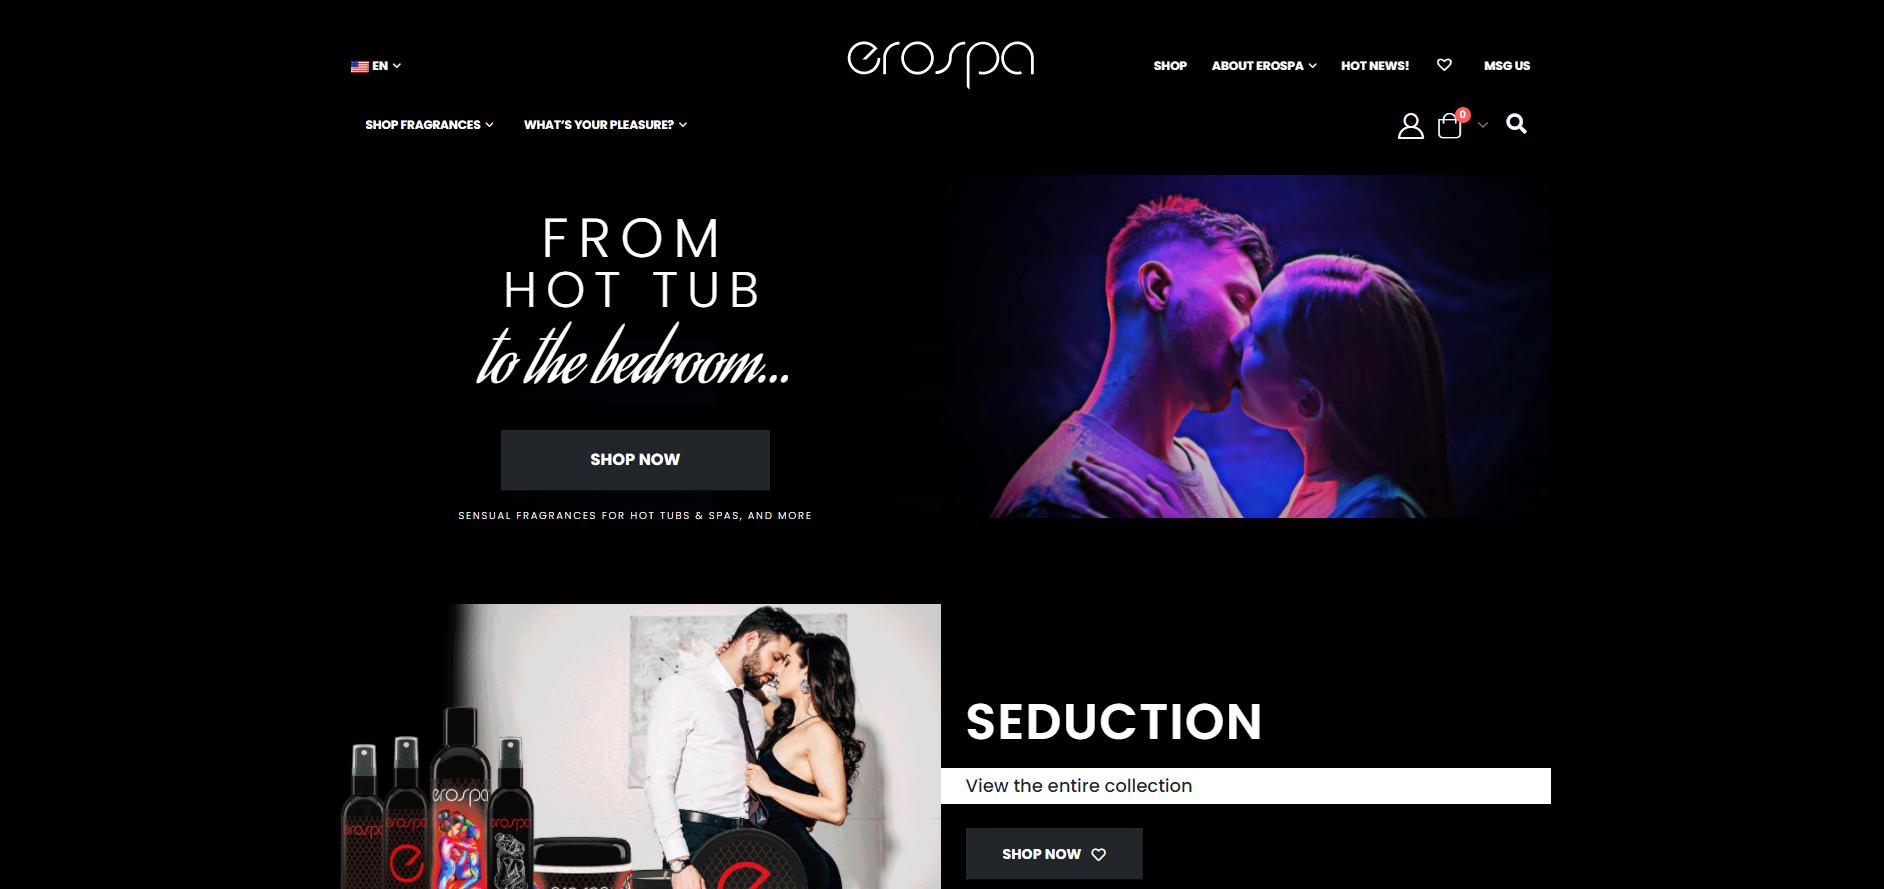 Erospa